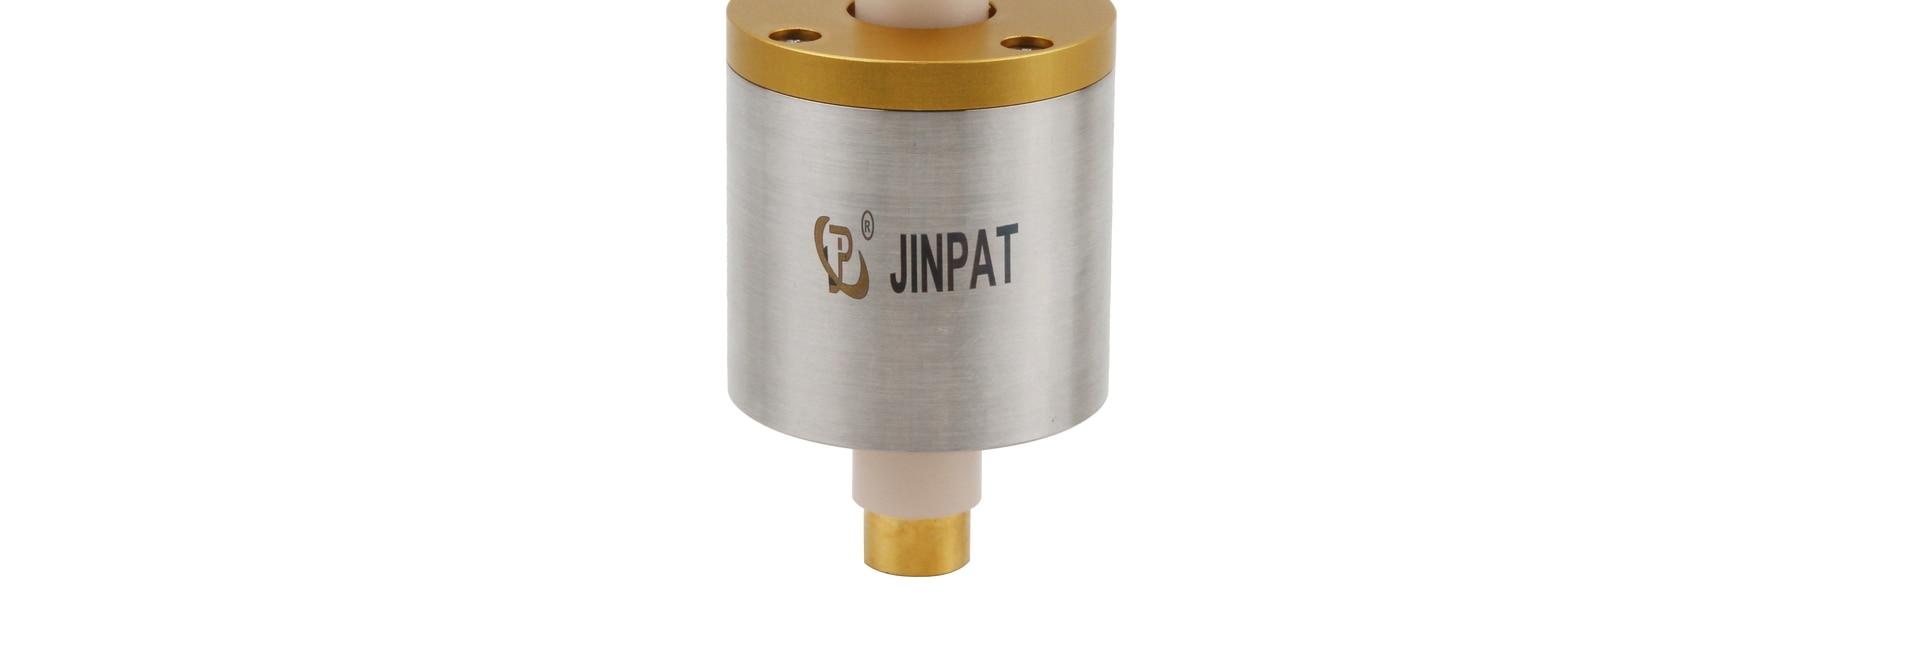 JINPAT Liquid Metal Contact Slip Ring